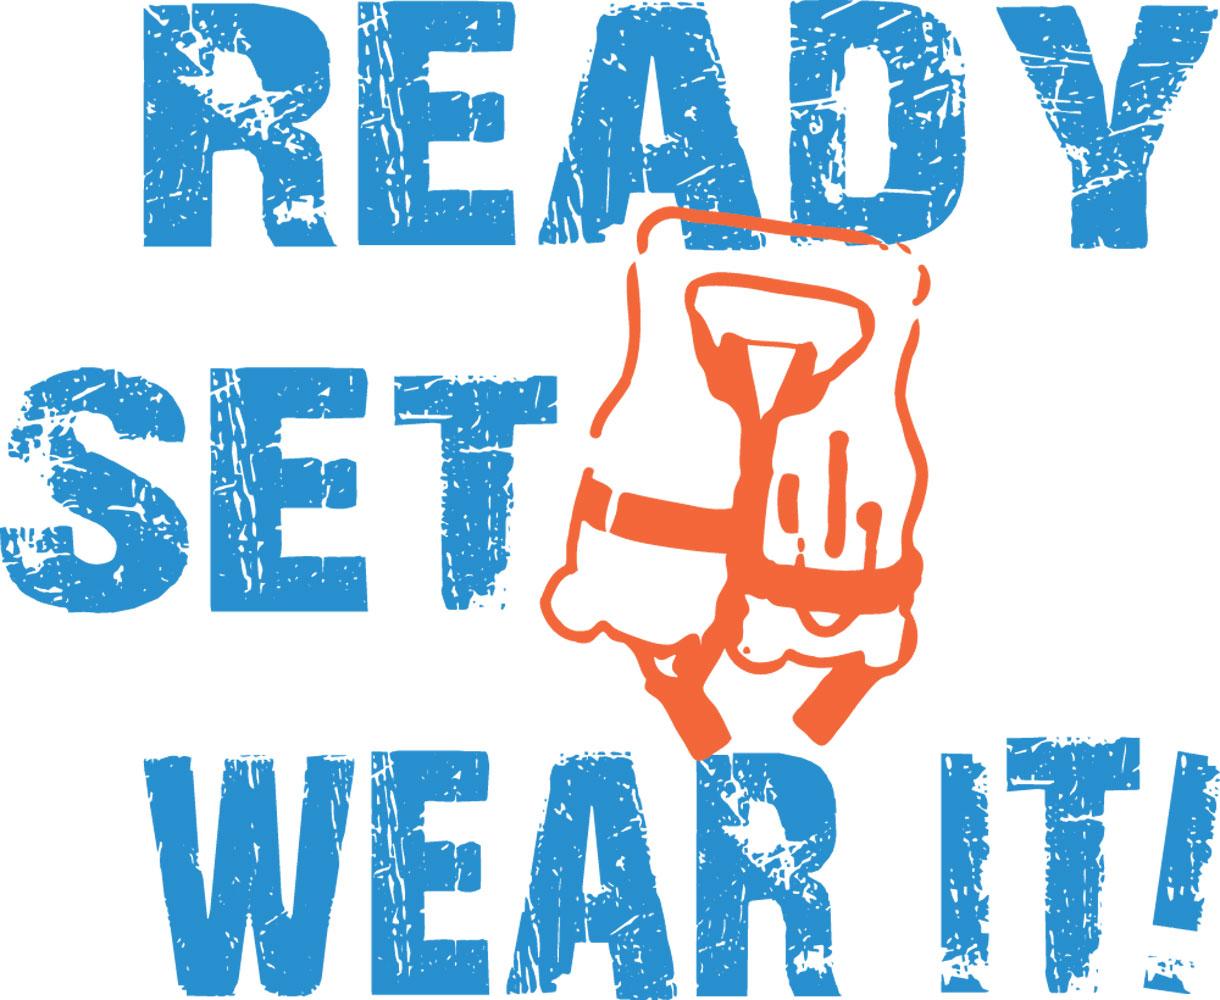 'Ready, Set, Wear It!' event kicks off Safe Boating Week